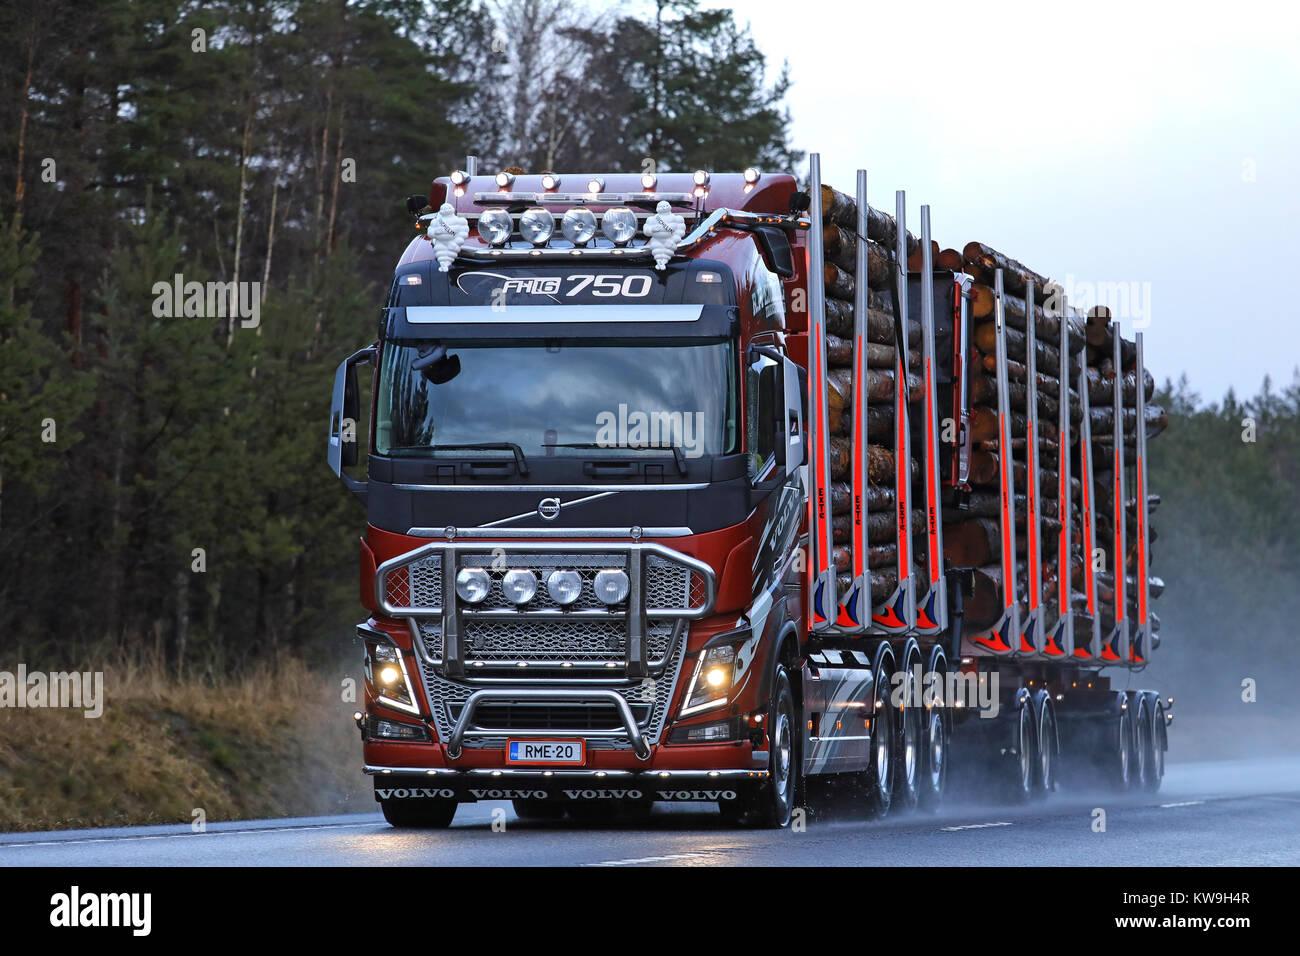 Raasepori Finland December 27 2017 Volvo Fh16 750 Logging Truck